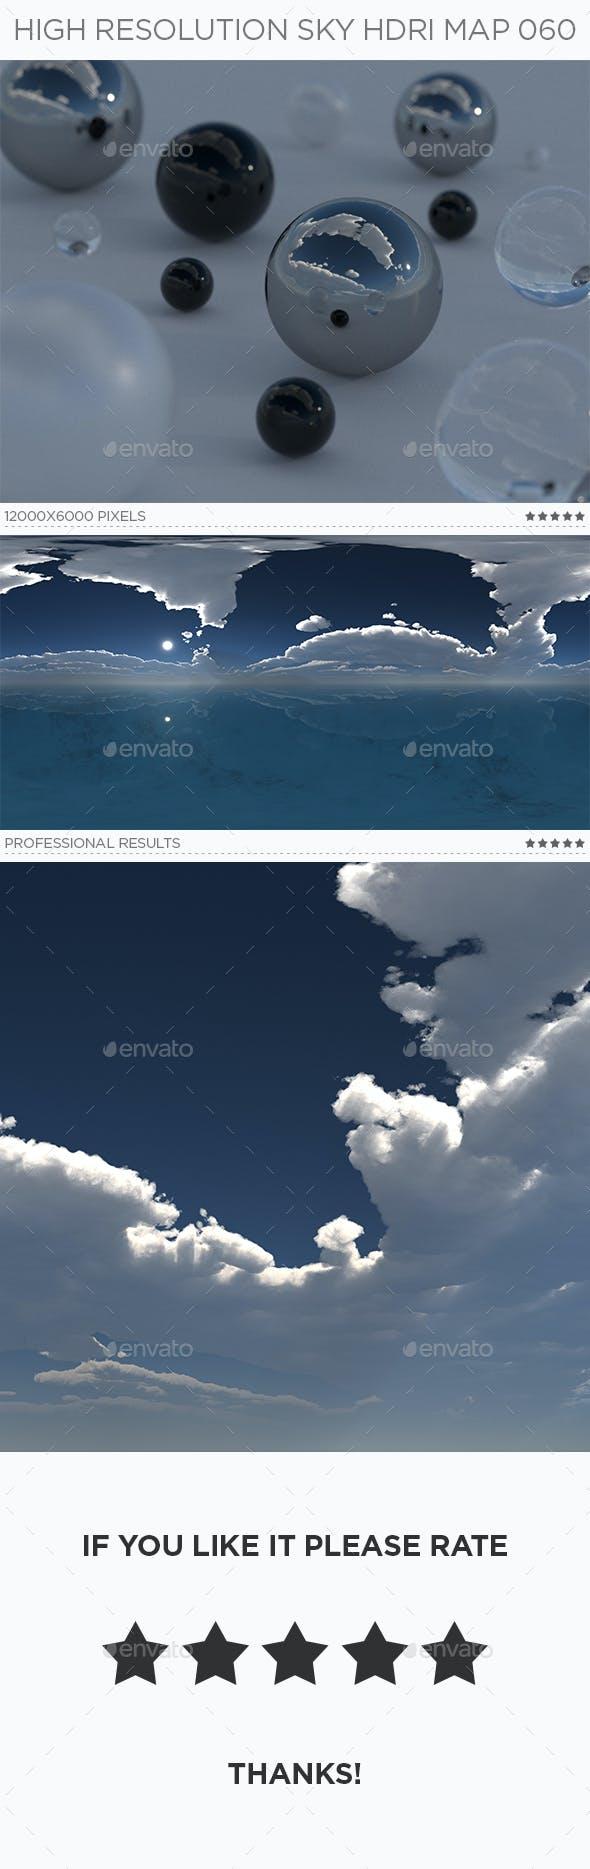 High Resolution Sky HDRi Map 060 - 3DOcean Item for Sale